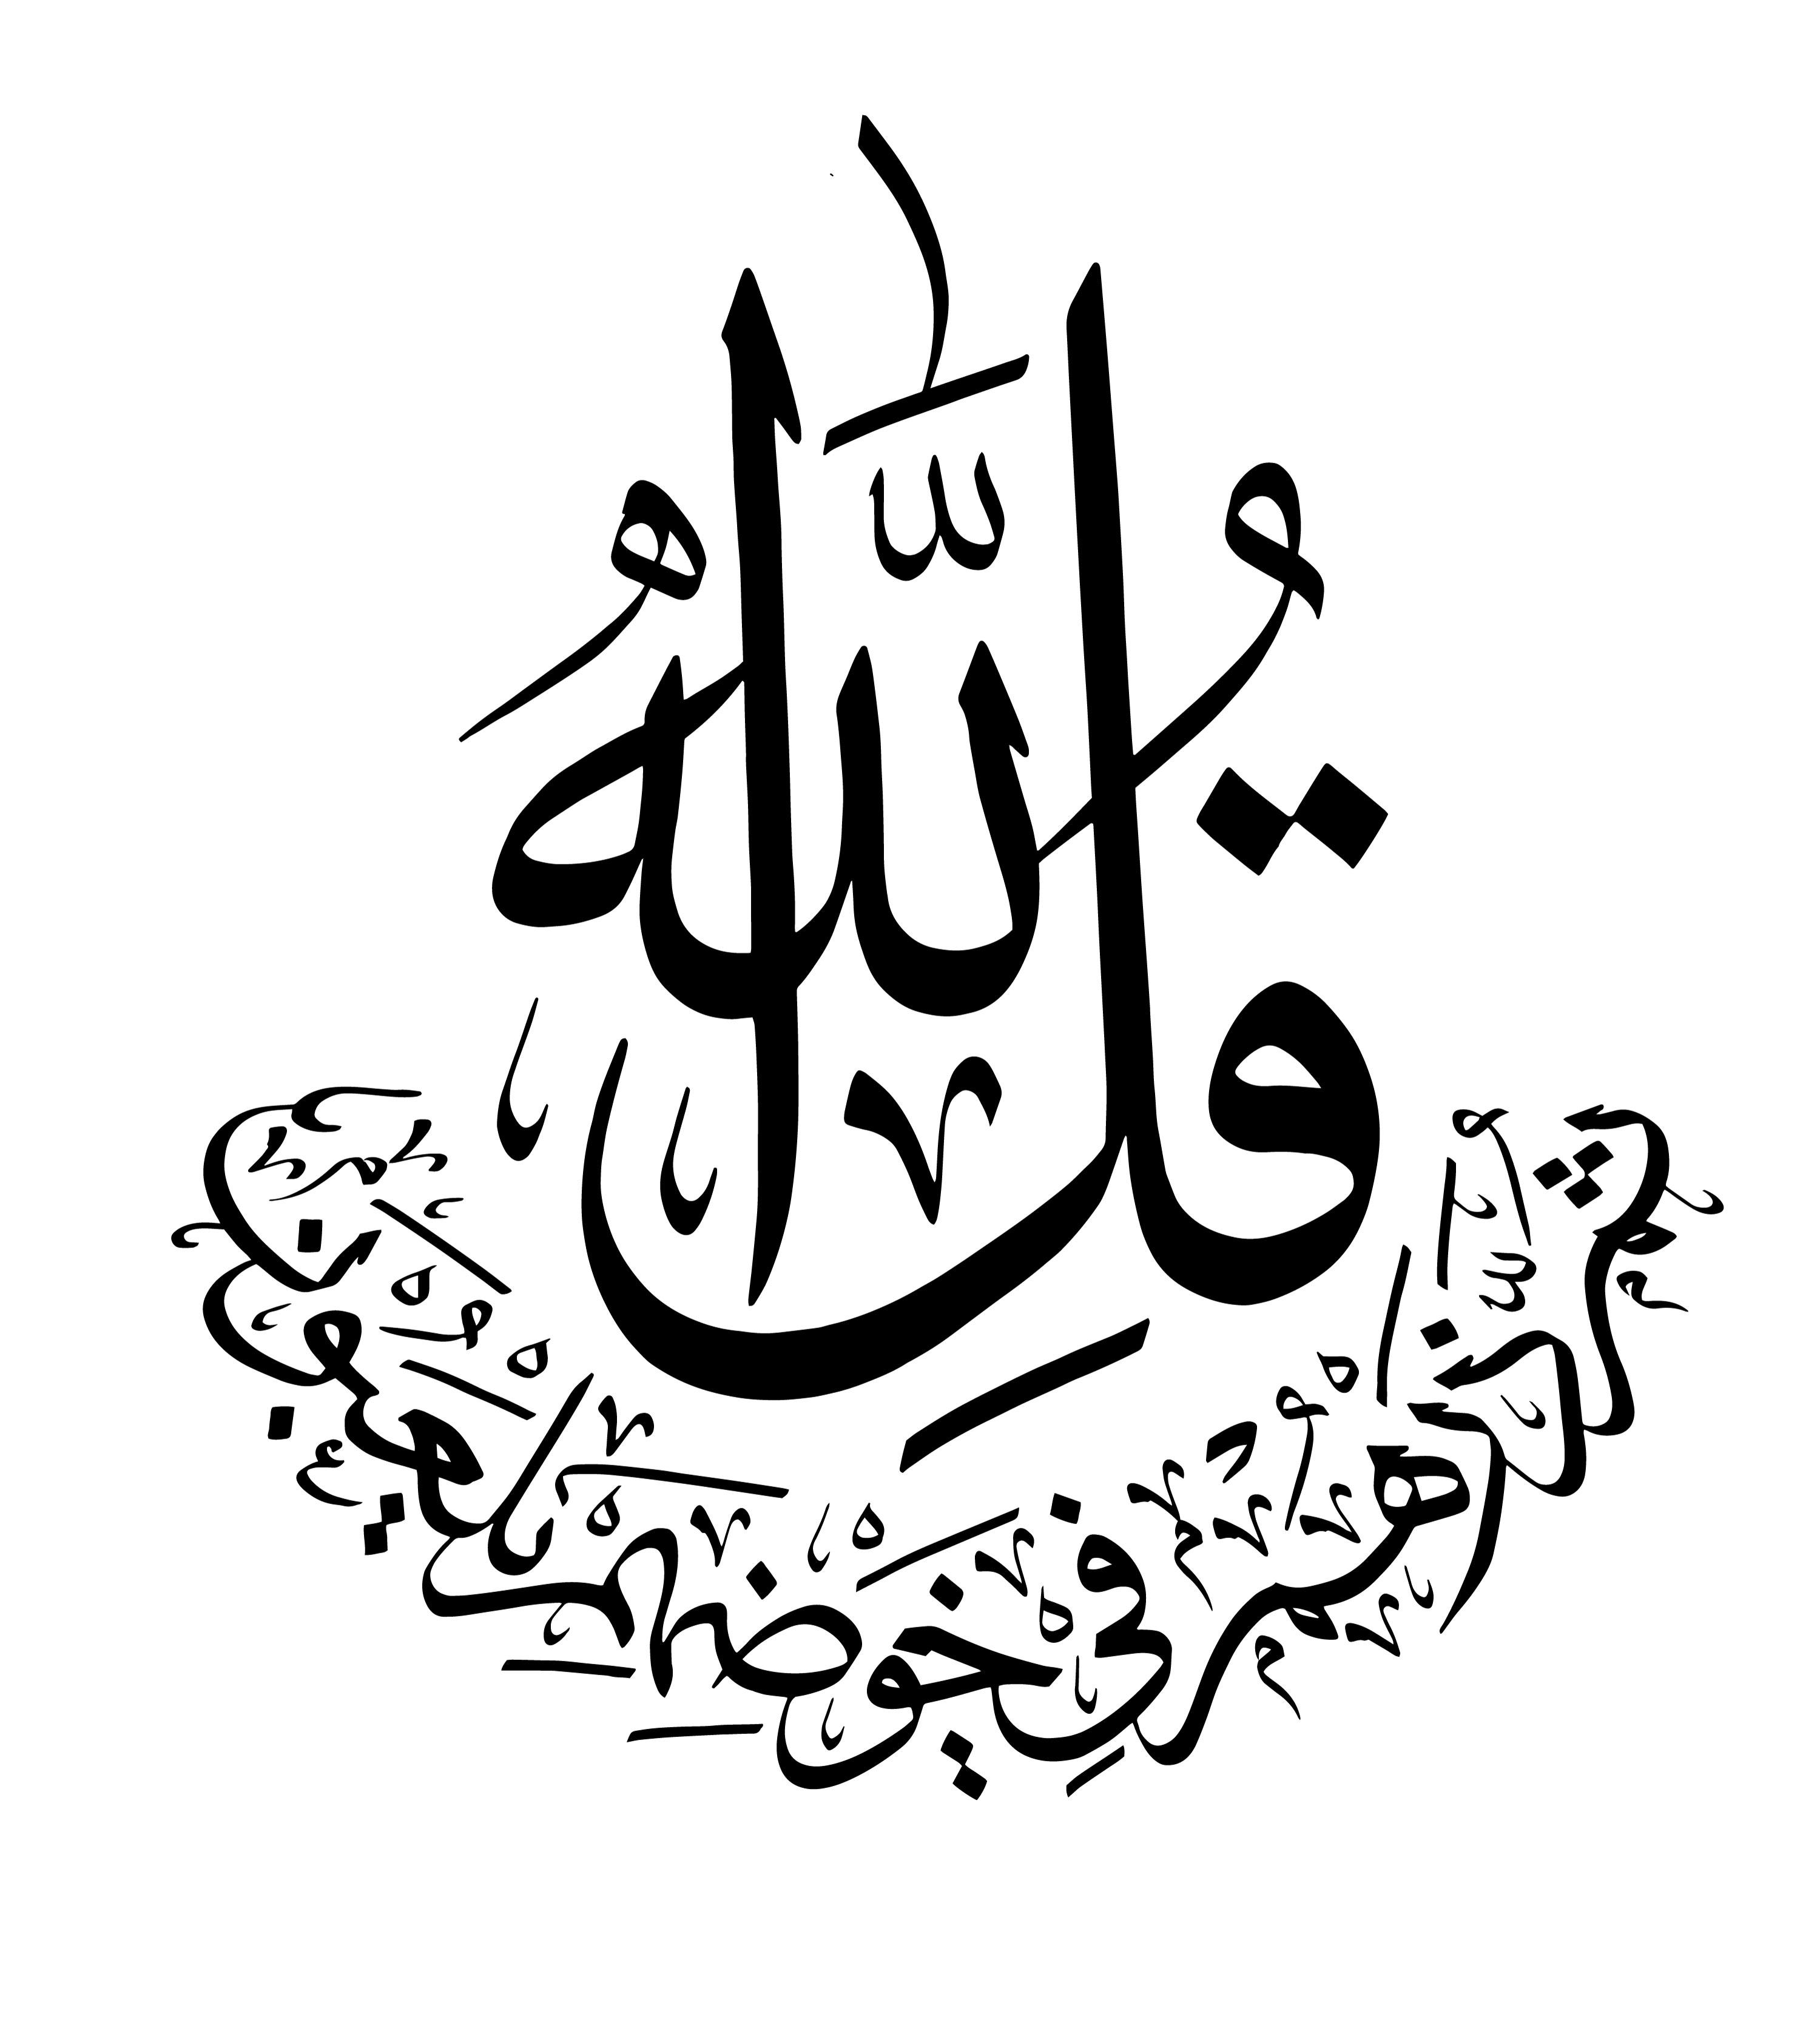 Free islamic calligraphy al 'an`am